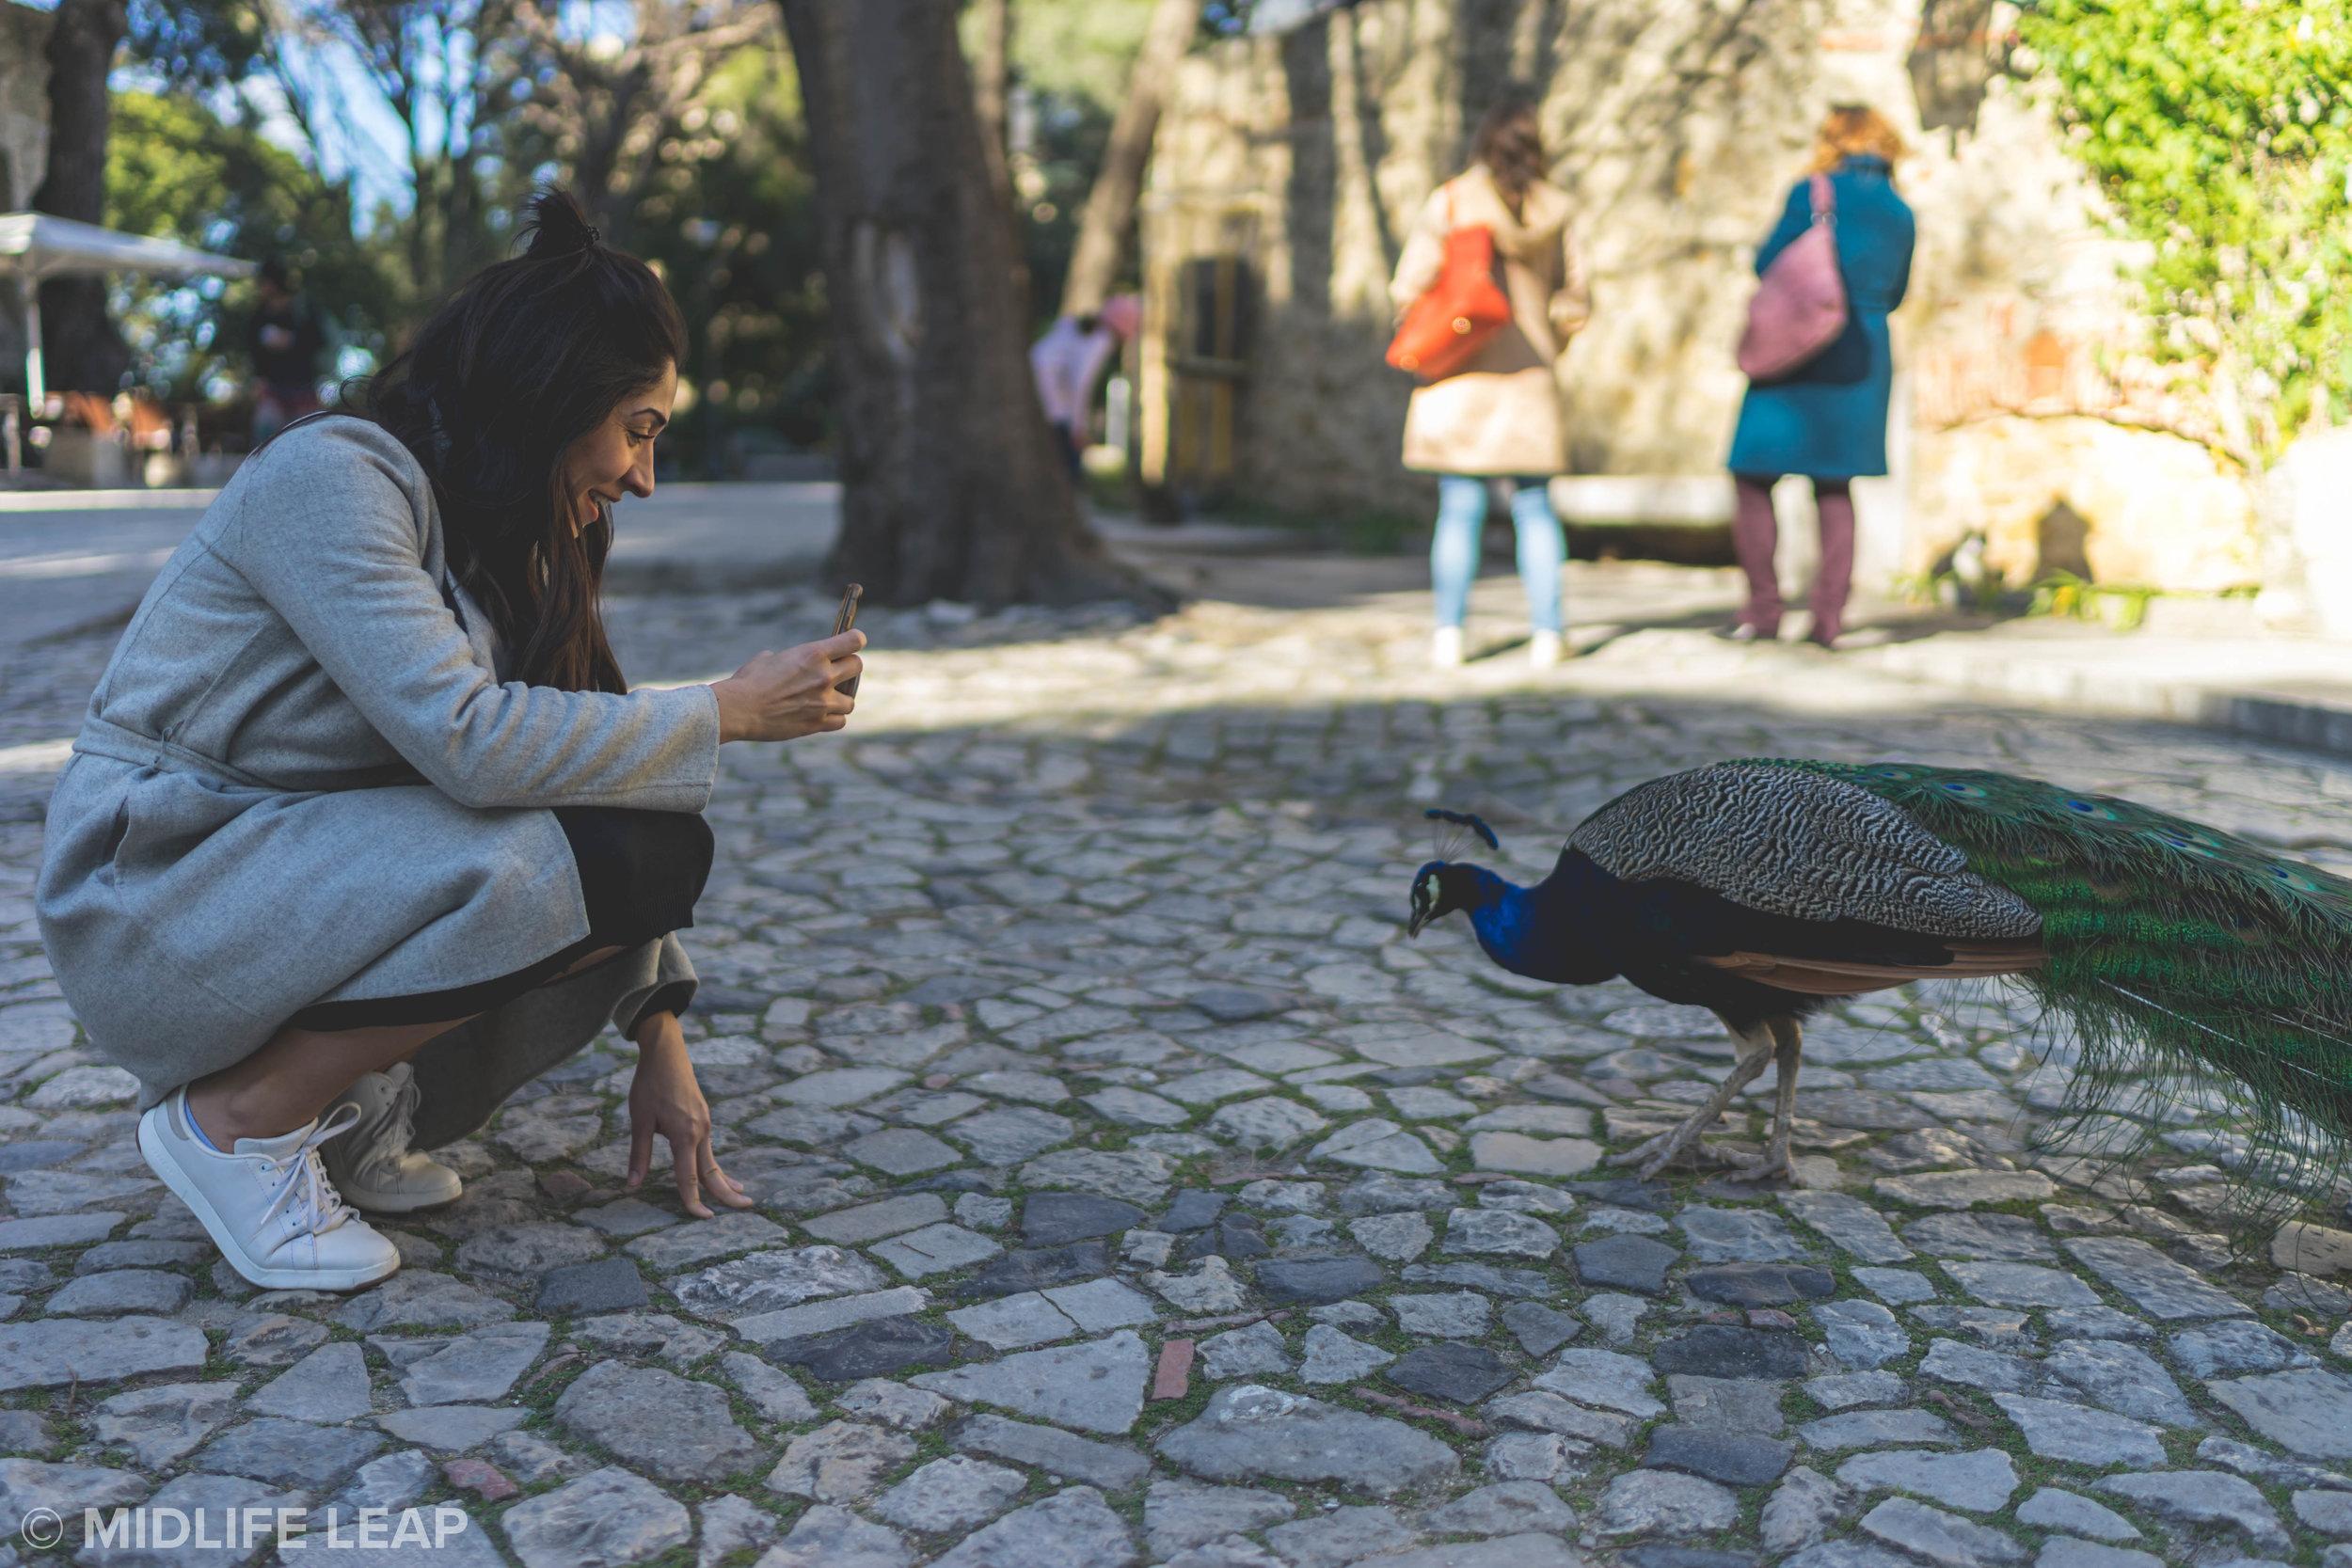 peacocks-at-castelo-de-sao-jorge-what-to-do-in-lisbon